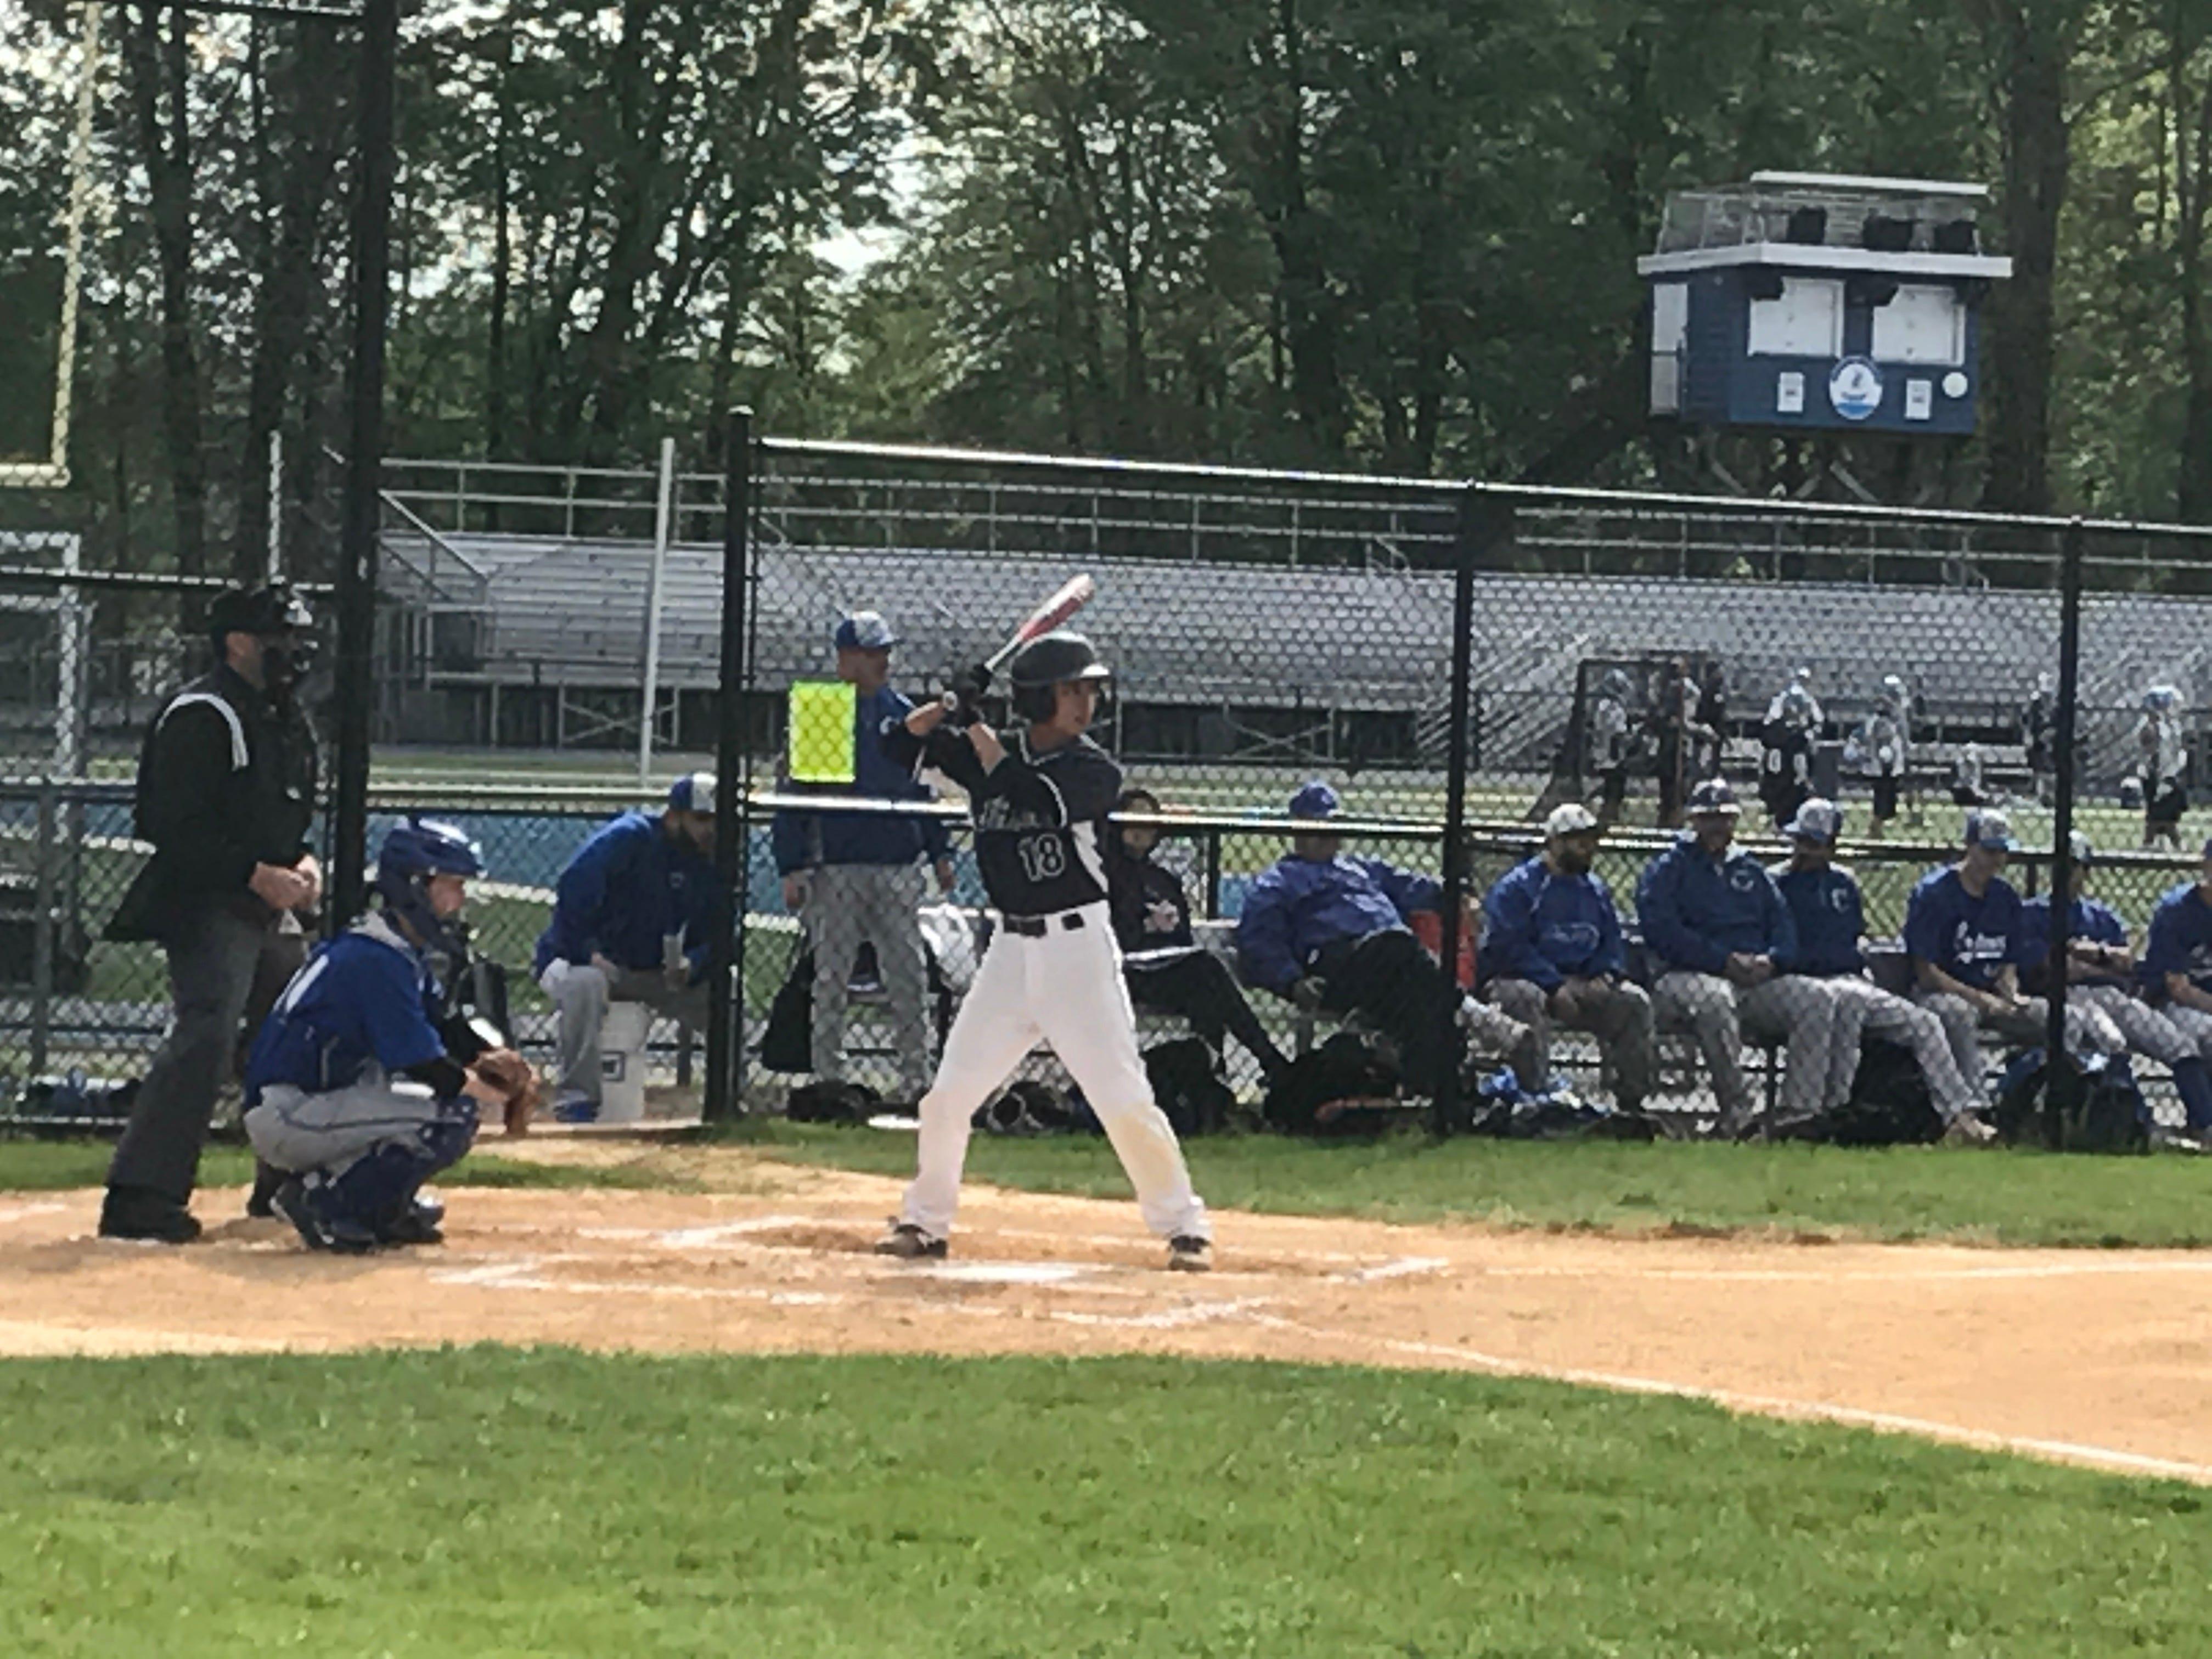 Michael Sot bats during a 2017 Arthur L. Johnson Regional High School baseball game.